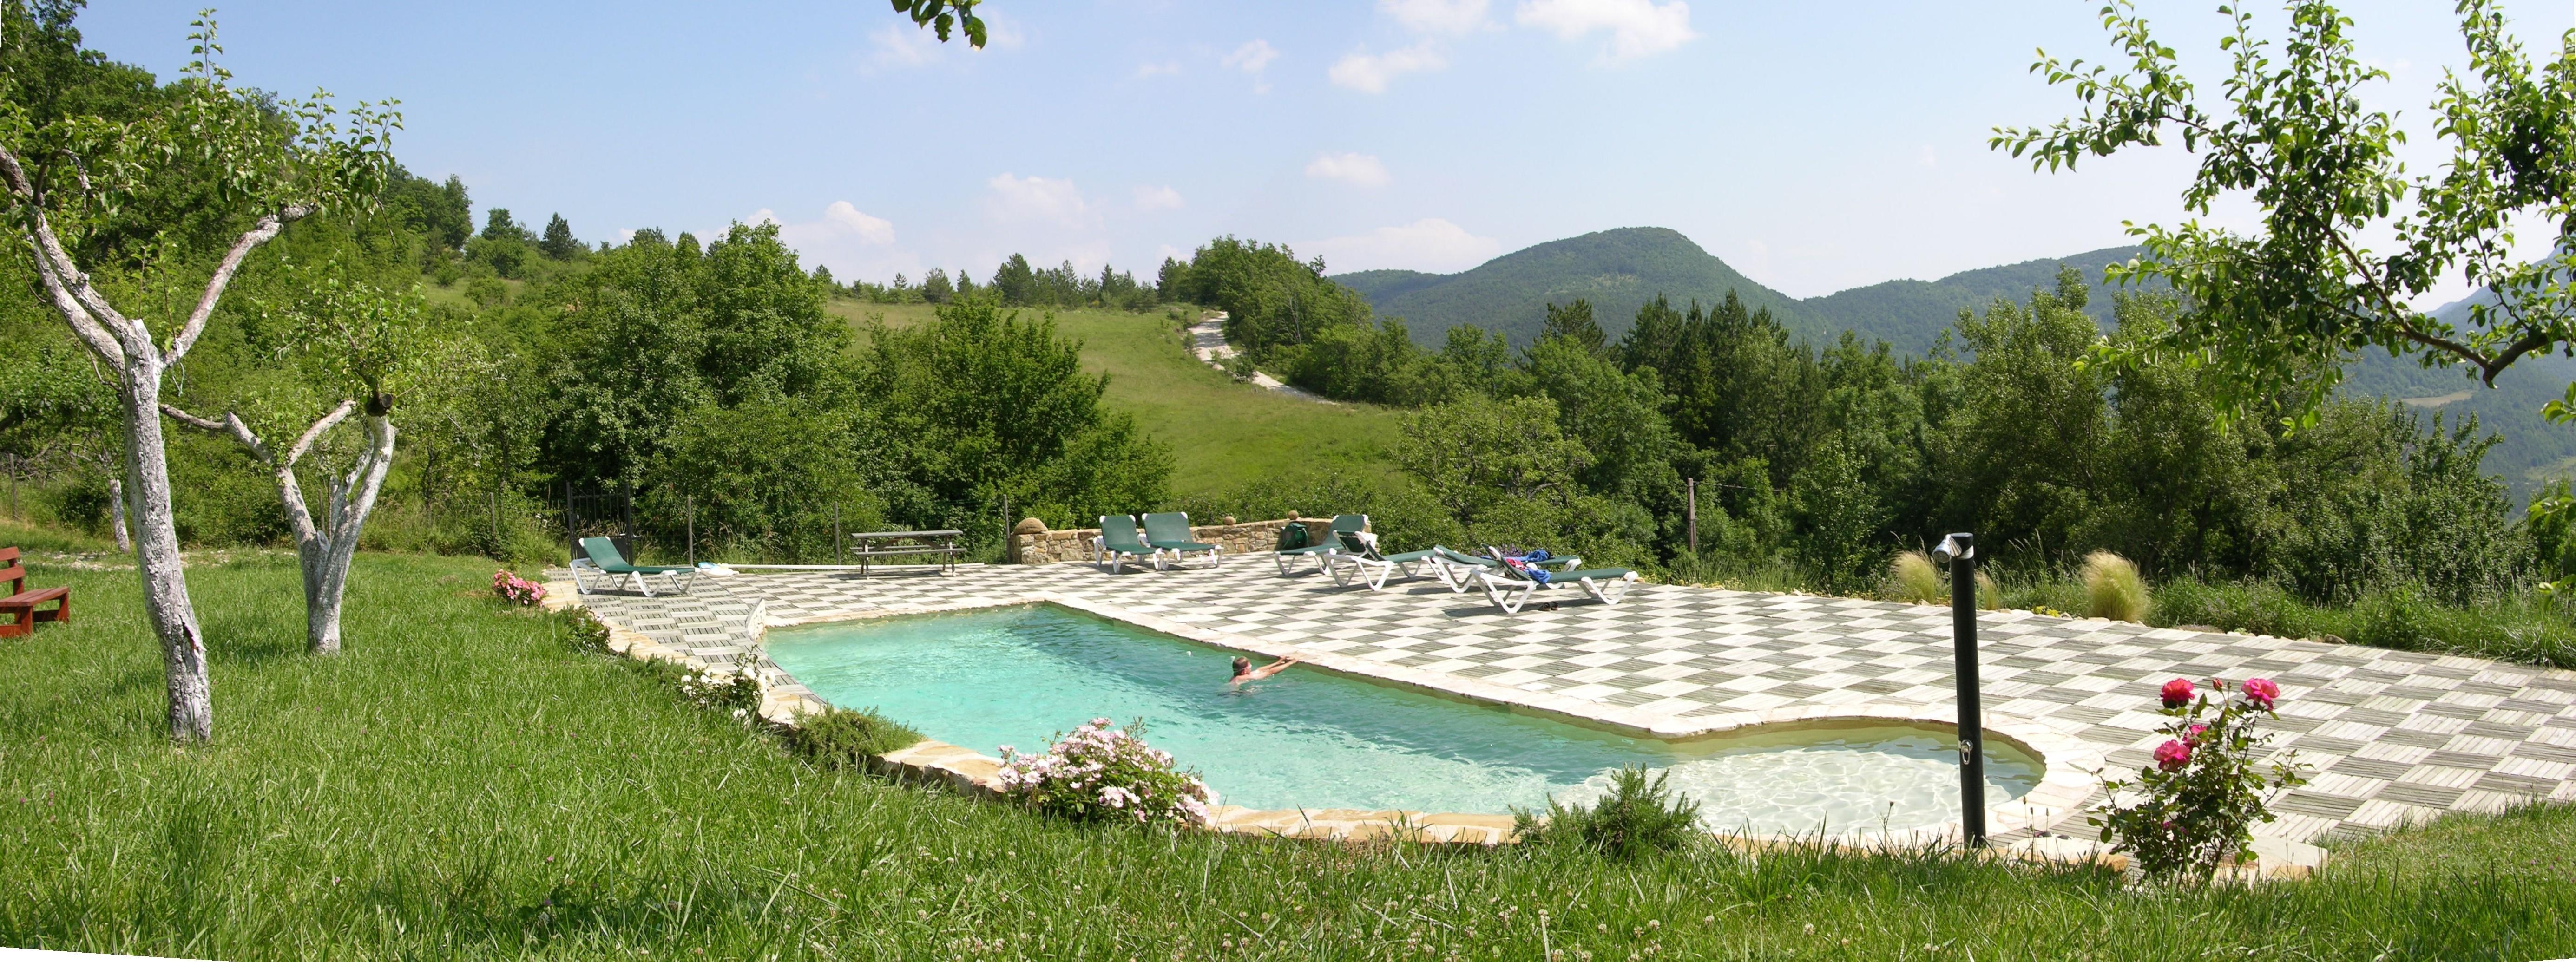 piscine 60 m² avec pataugoire enfants